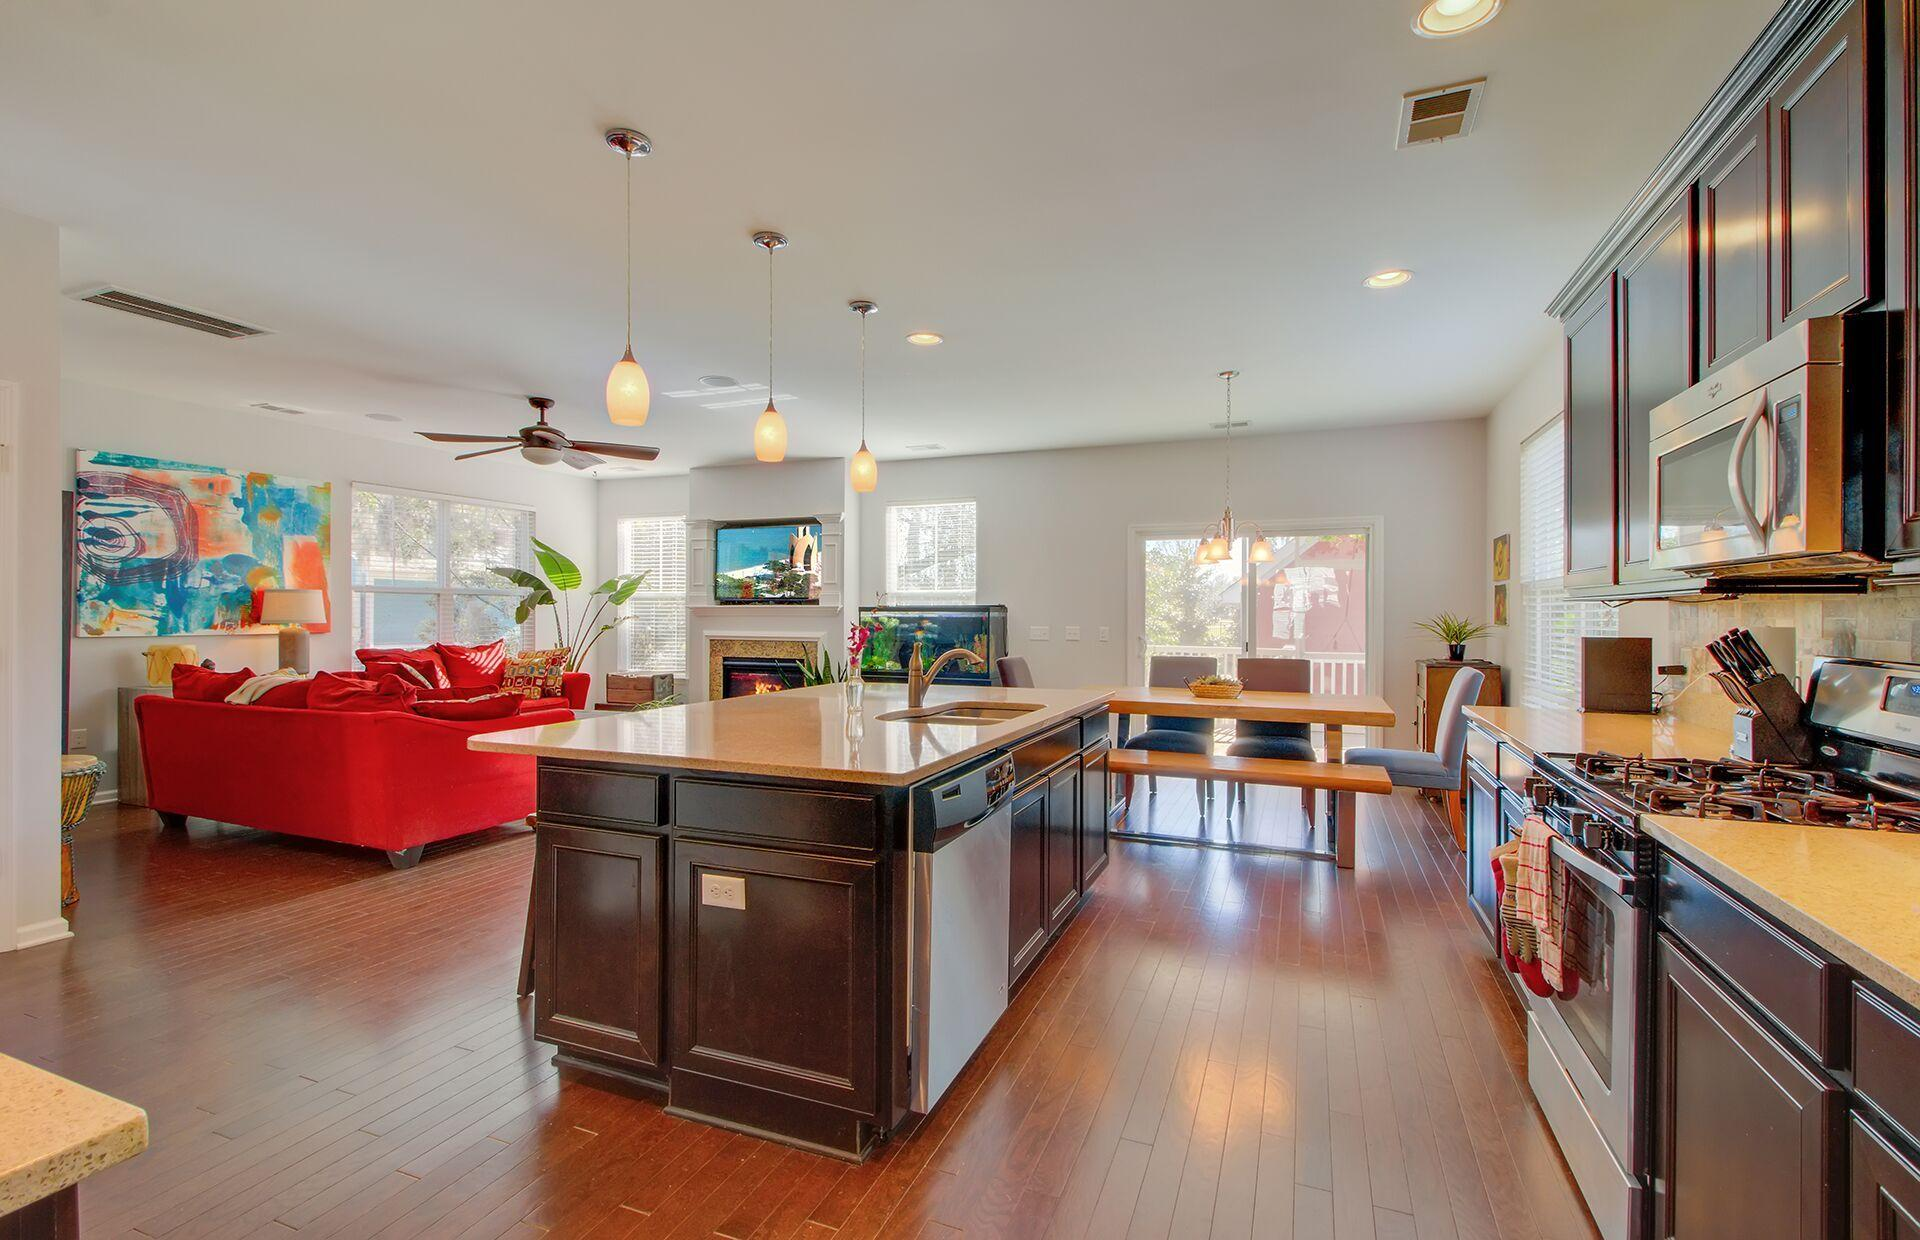 Oak Terrace Preserve Homes For Sale - 4967 Liberty Park, North Charleston, SC - 0